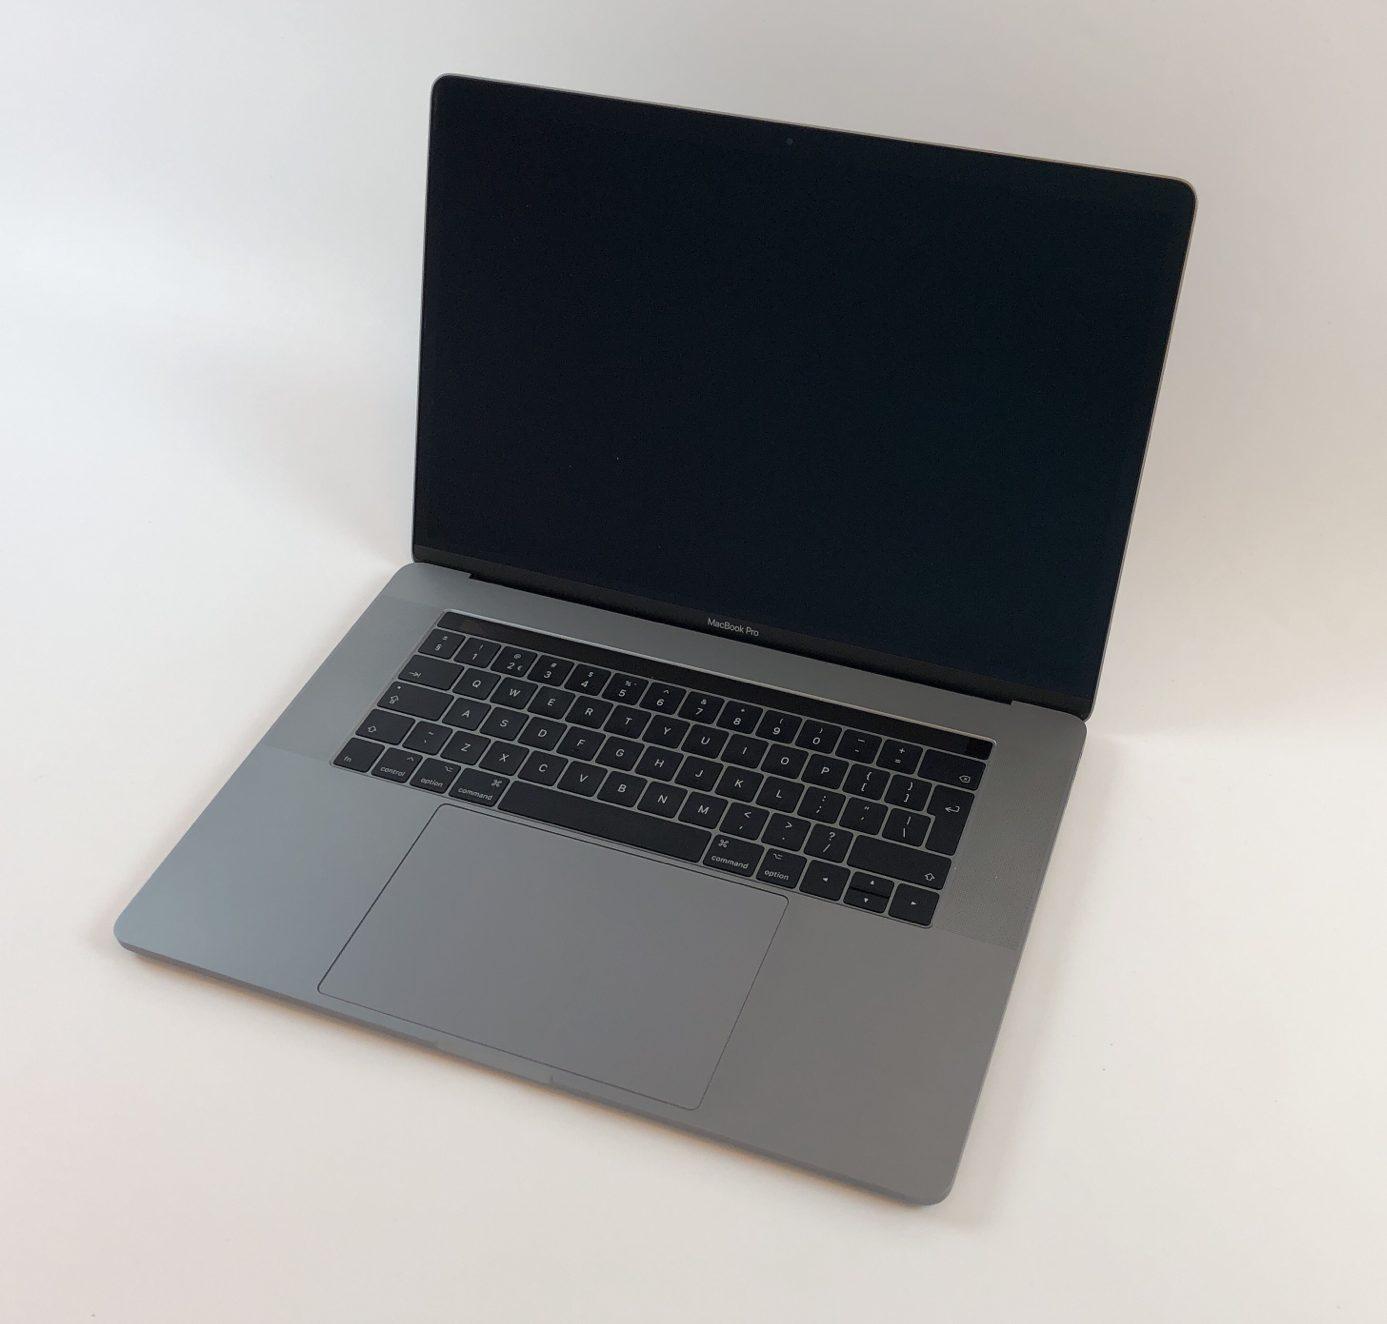 "MacBook Pro 15"" Touch Bar Mid 2017 (Intel Quad-Core i7 2.9 GHz 16 GB RAM 512 GB SSD), Space Gray, Intel Quad-Core i7 2.9 GHz, 16 GB RAM, 512 GB SSD, Afbeelding 1"